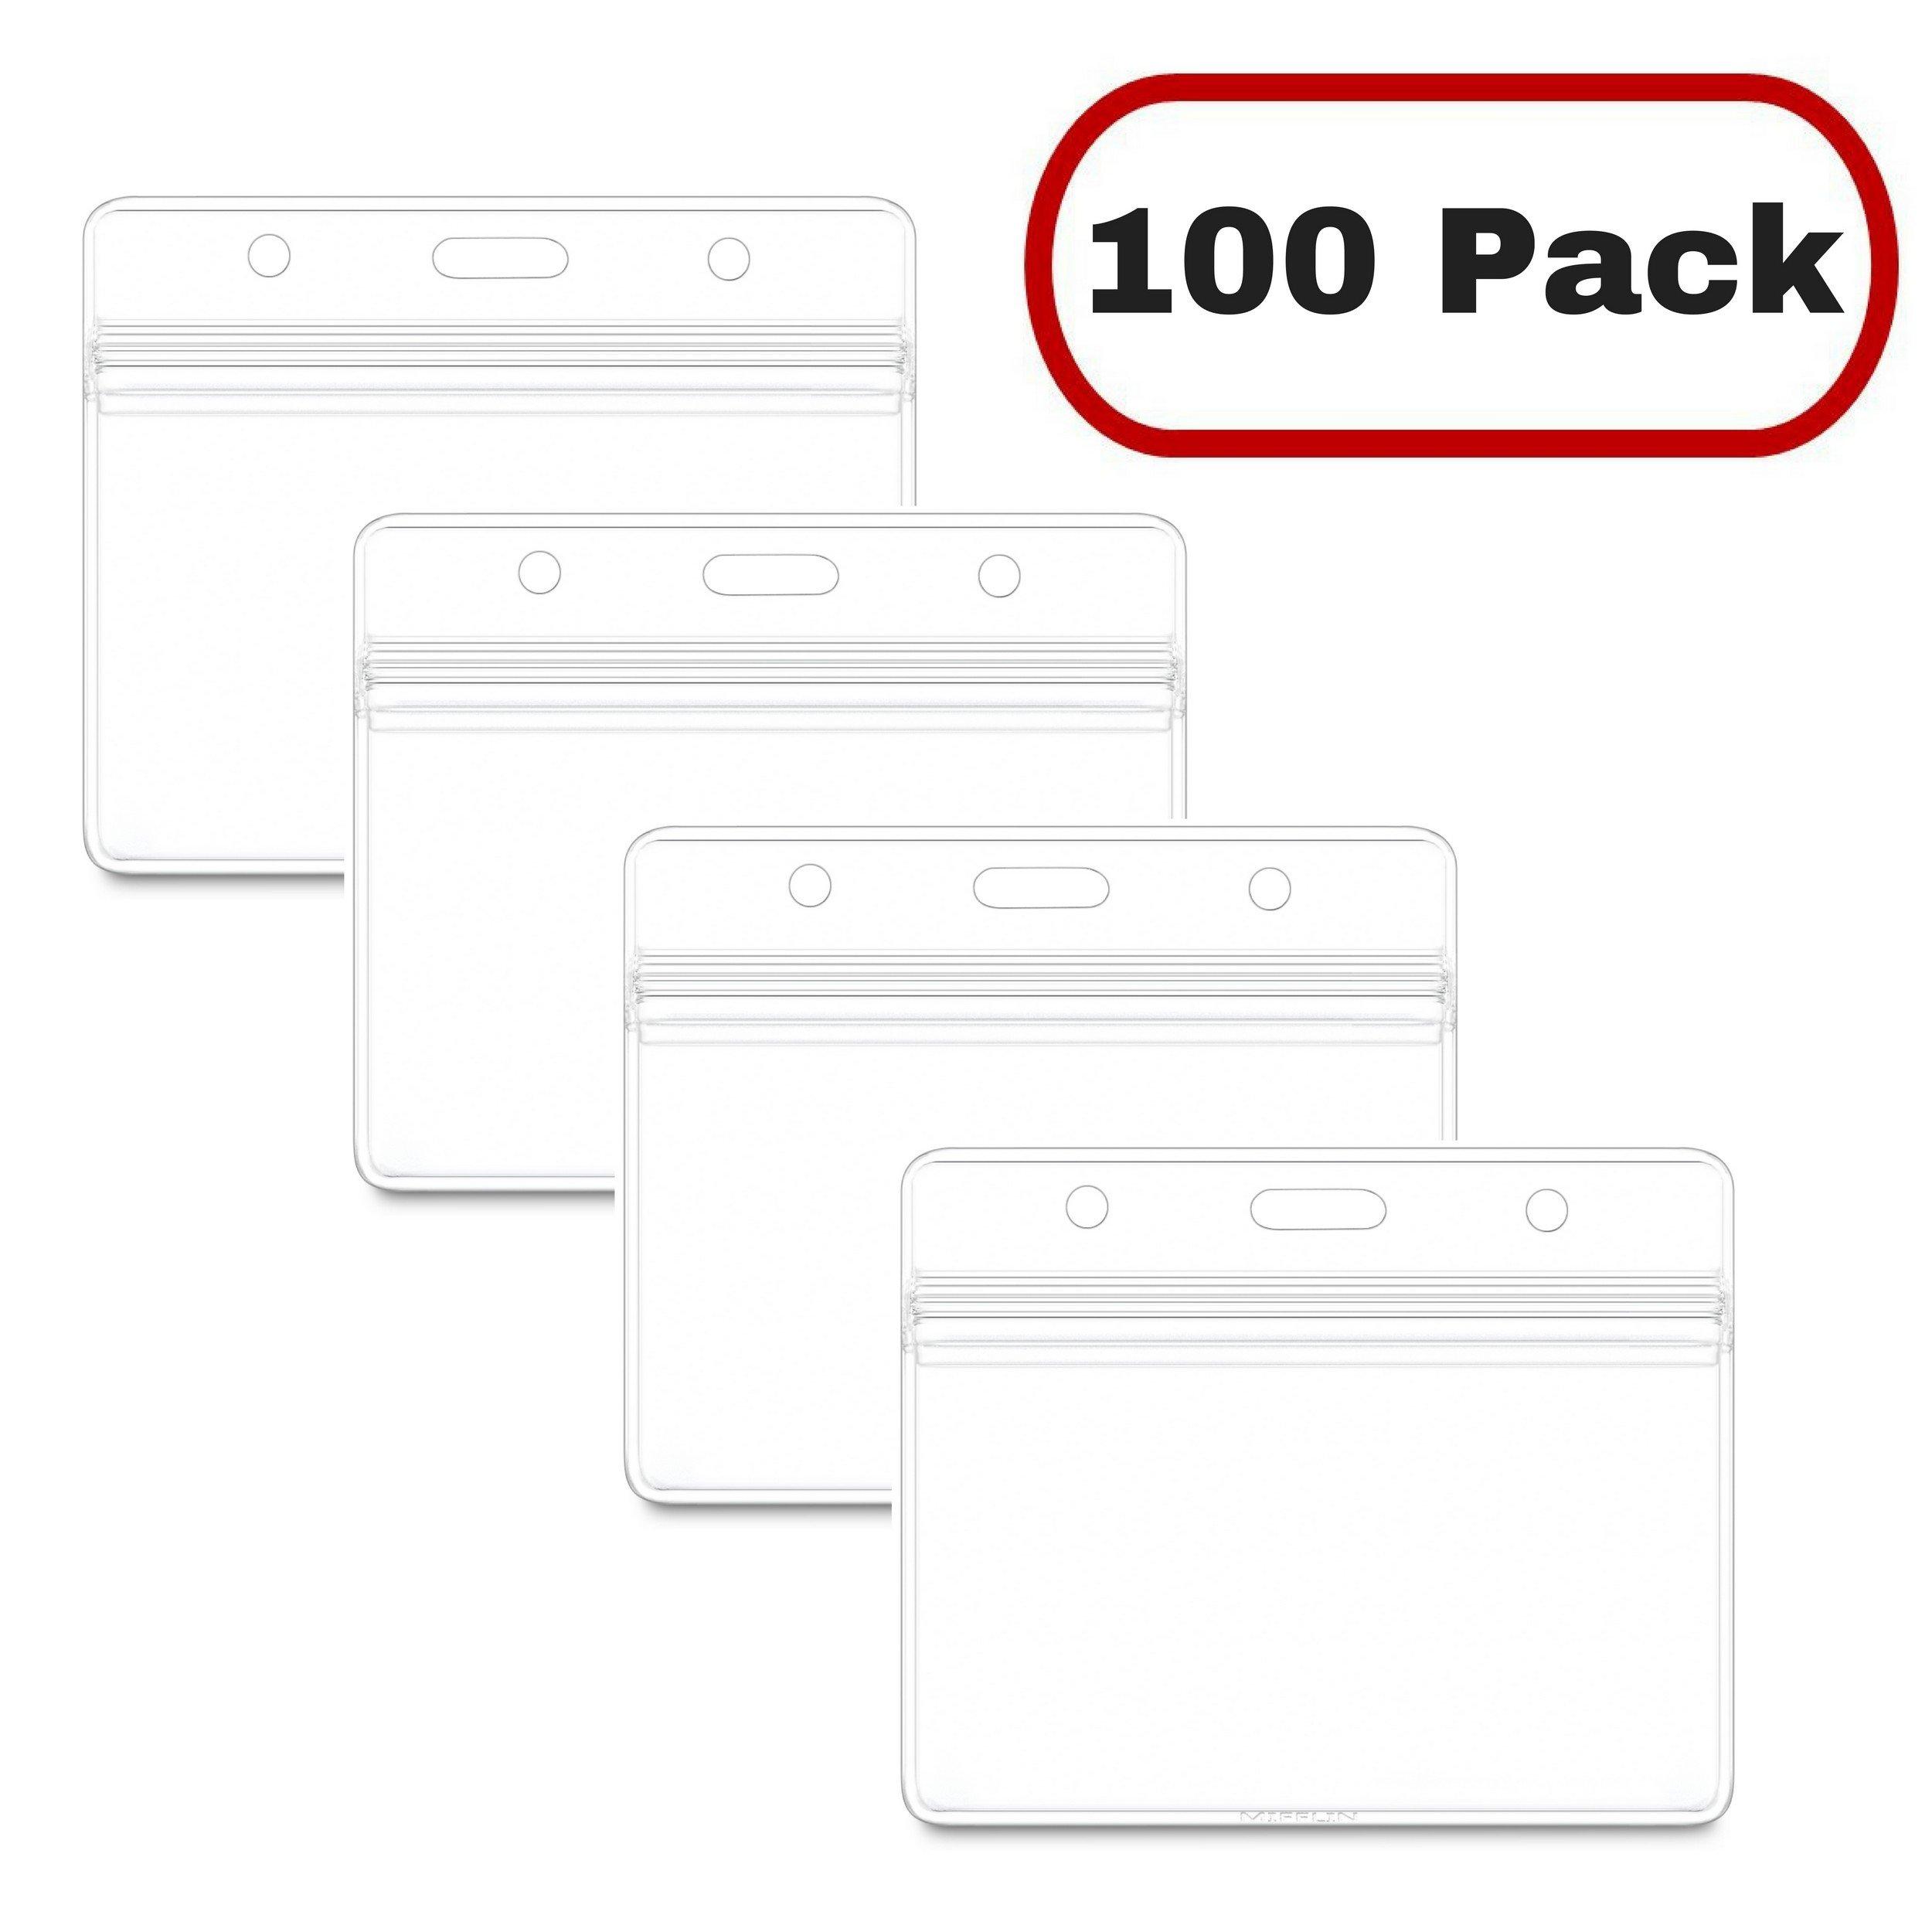 MIFFLIN Horizontal Nametag Name Badge Holders (Standard 2.25x3.5, 100 Pack)